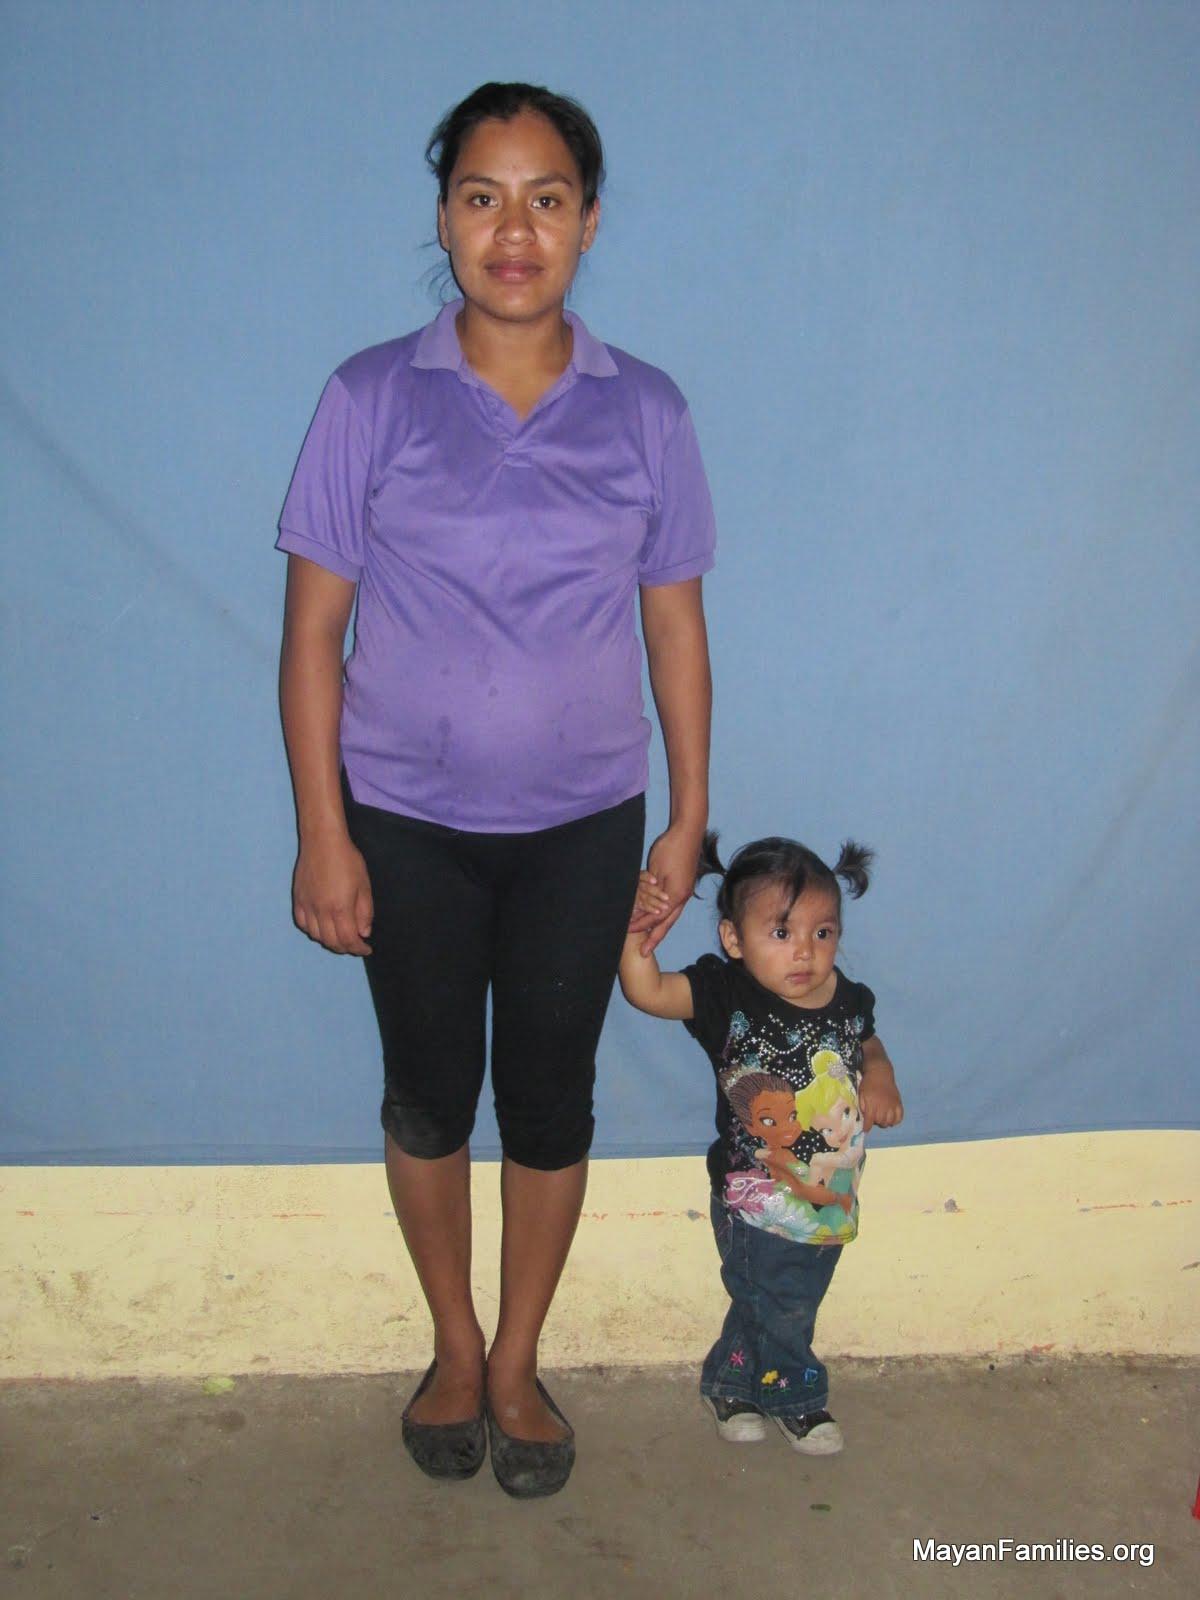 Brenda Lopez is seven months